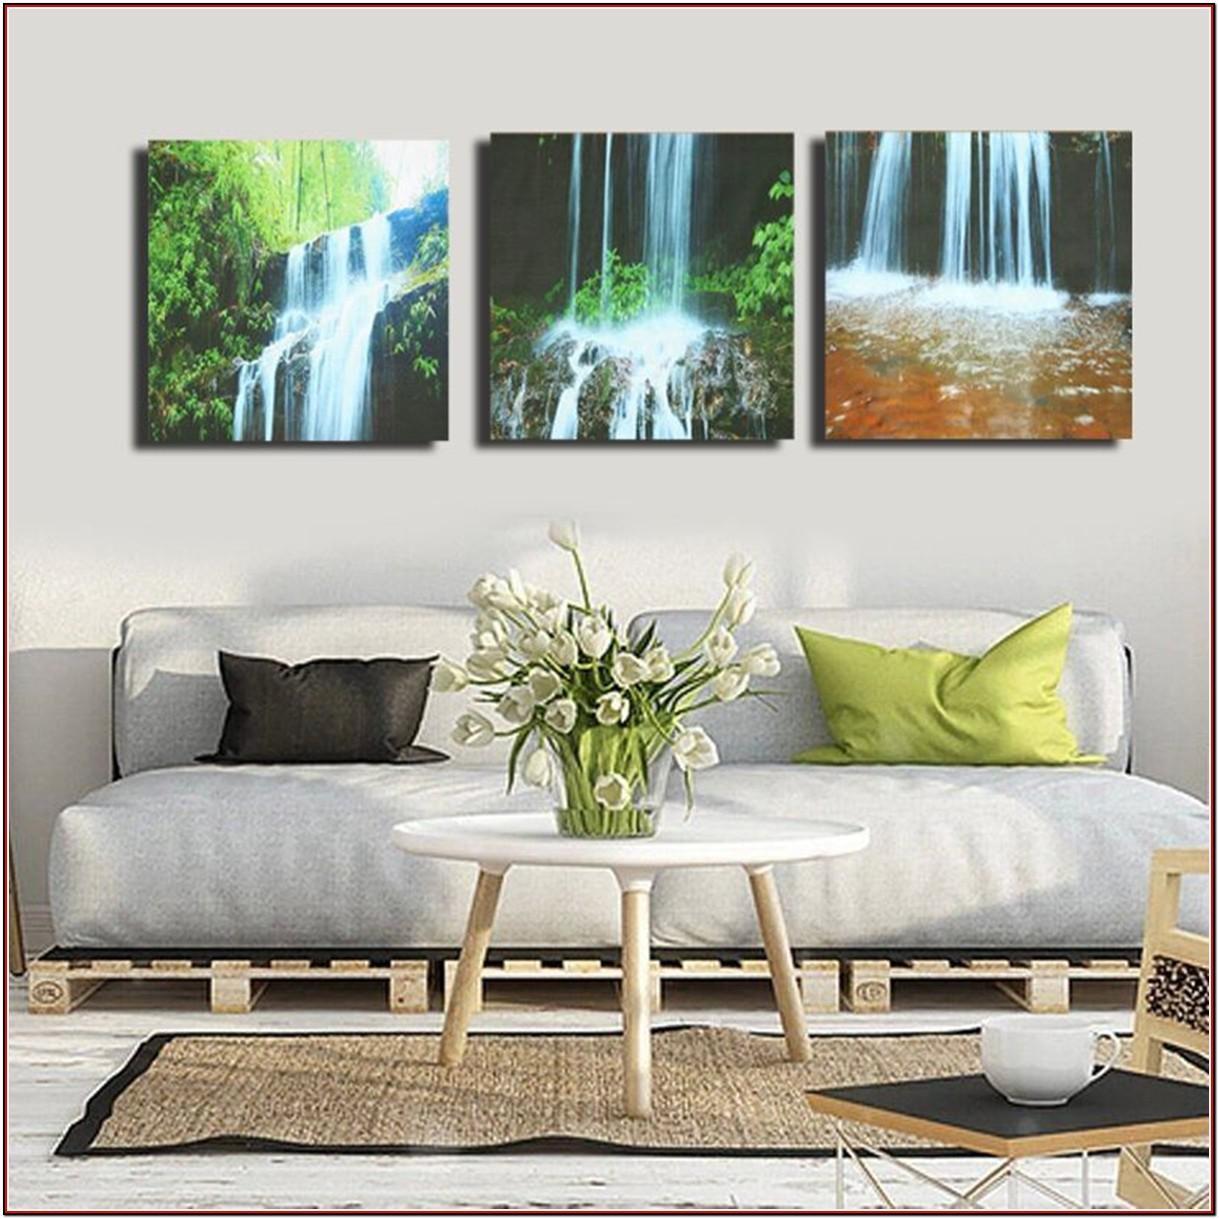 Large Living Room Canvas Art